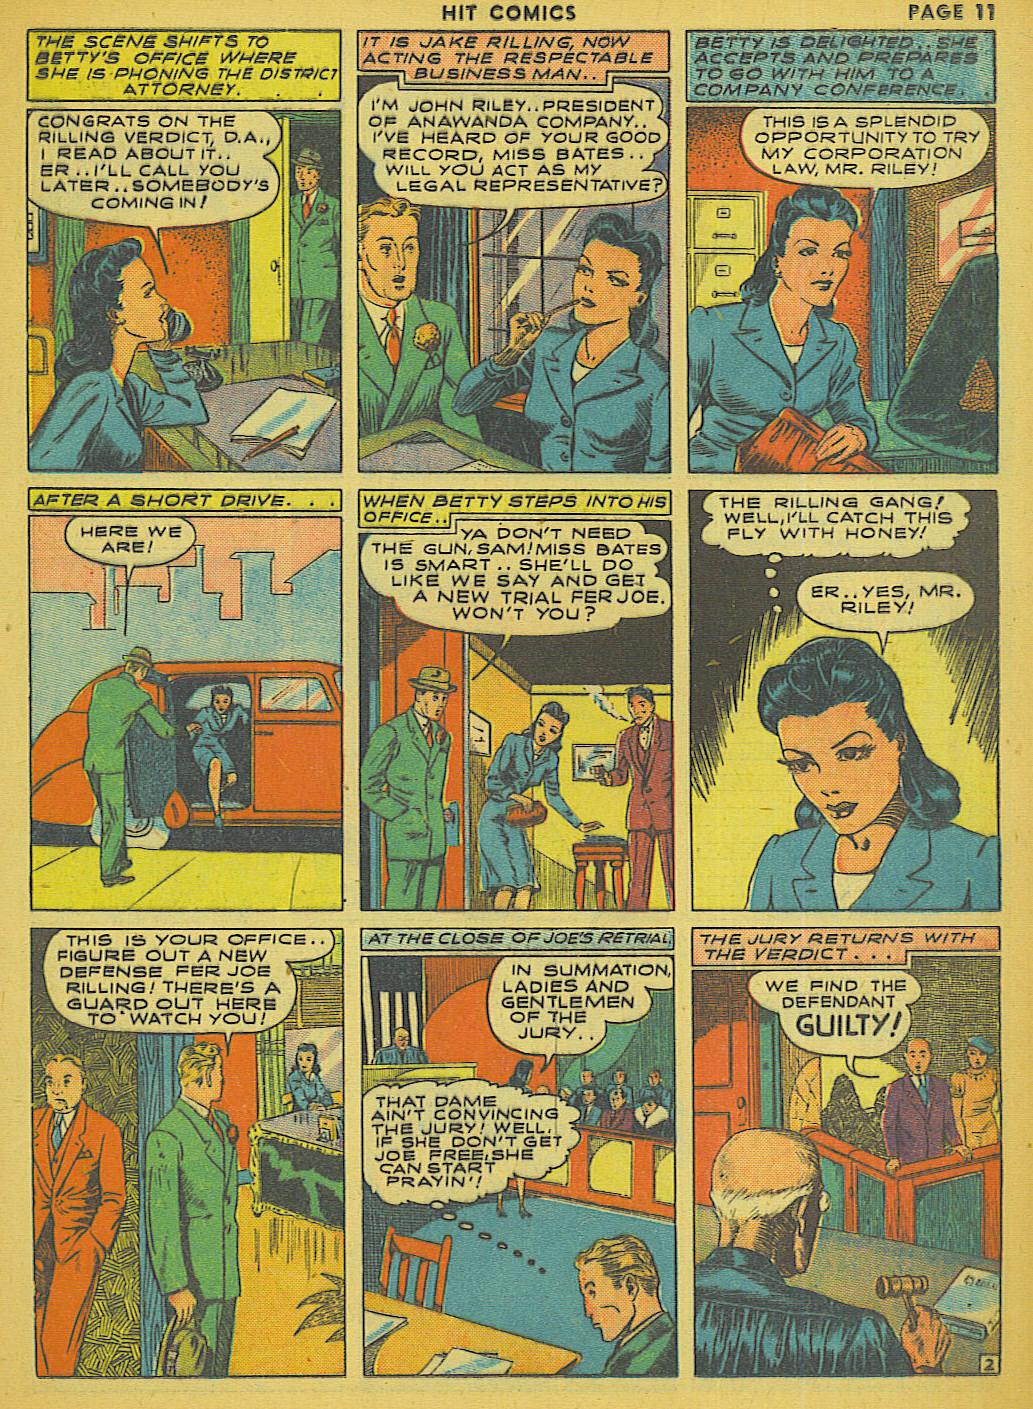 Read online Hit Comics comic -  Issue #13 - 13